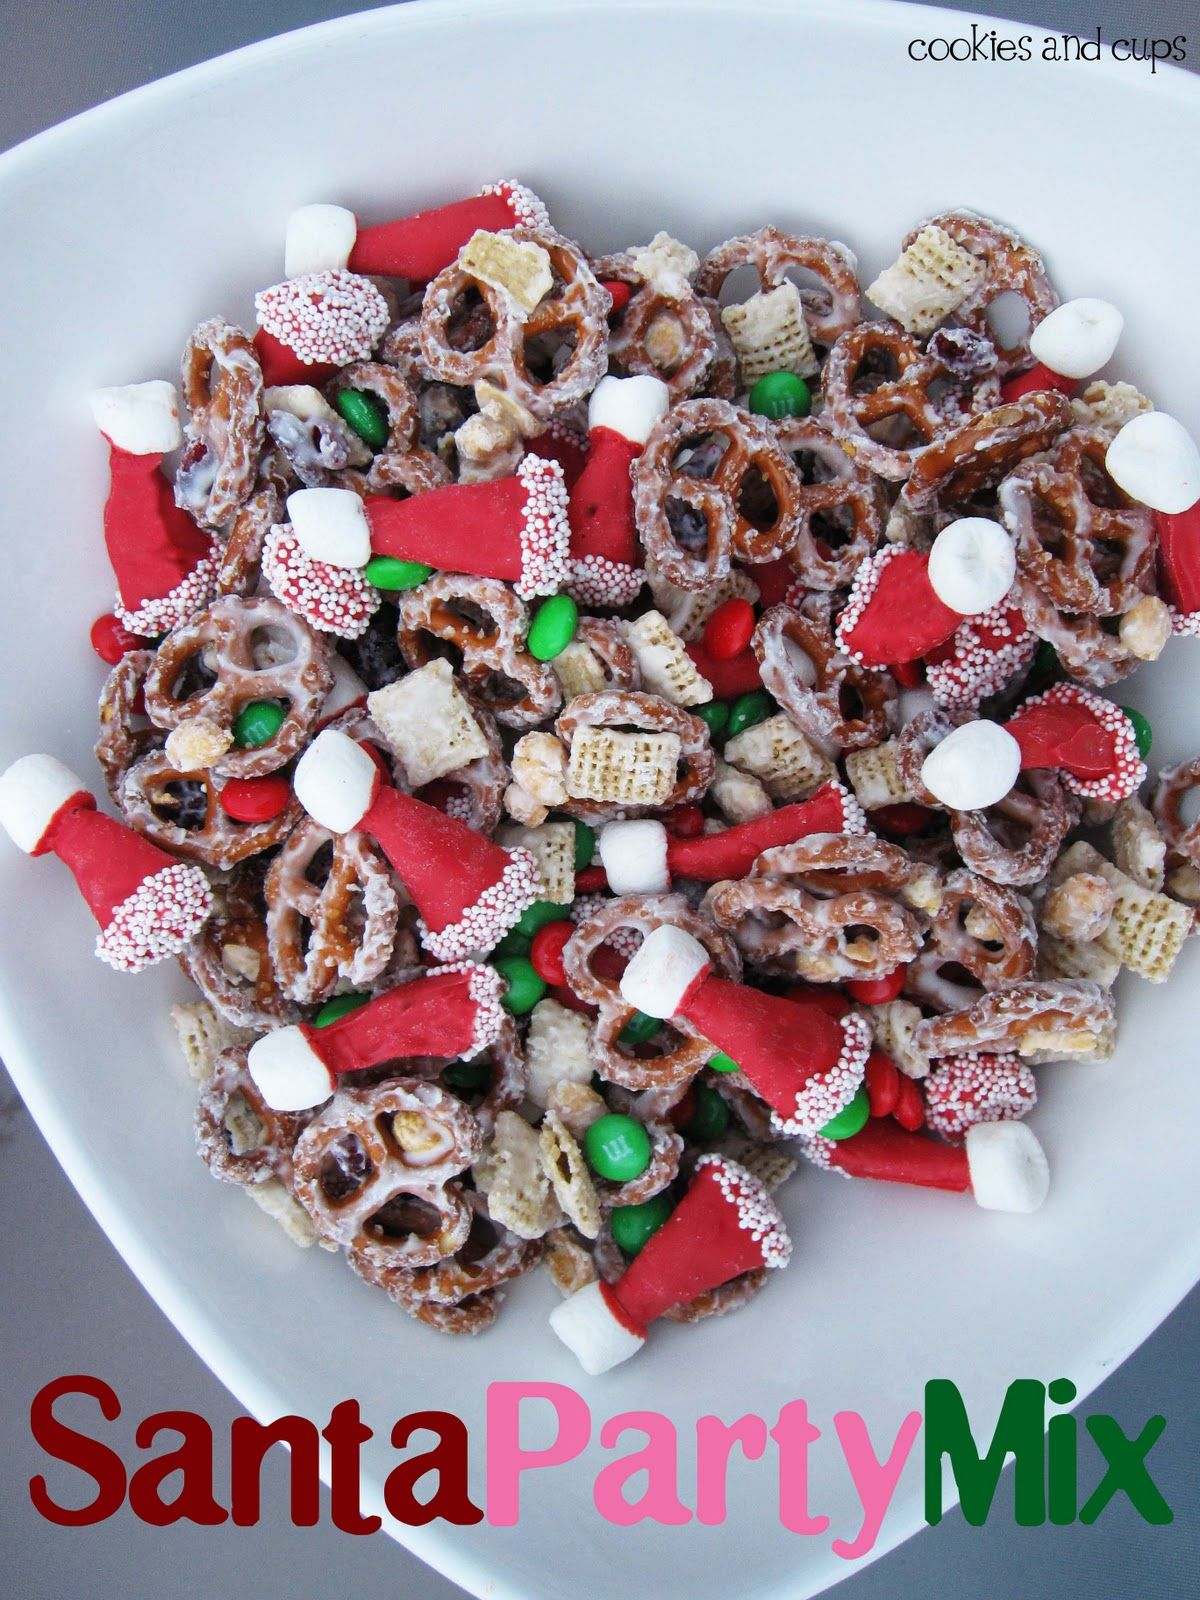 Santa Hat Party Mix Christmas GoodiesChristmas PartiesChristmas TimeChristmas Snack MixChristmas RecipesChristmas